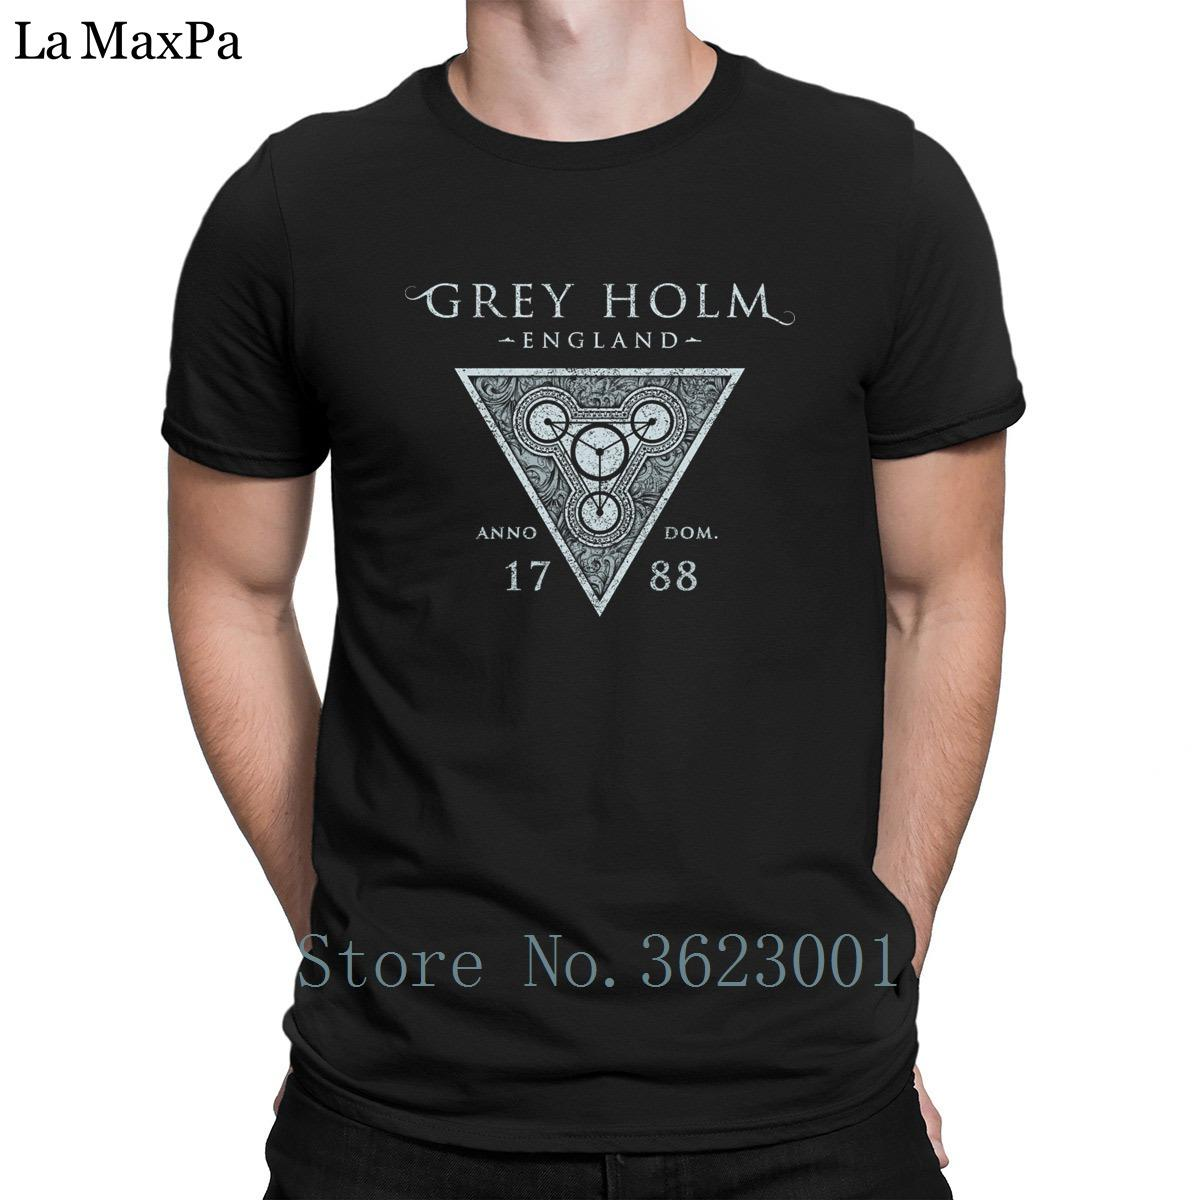 Designing Basic Mens Tee Shirt The Room Three Grey Holm T Shirt